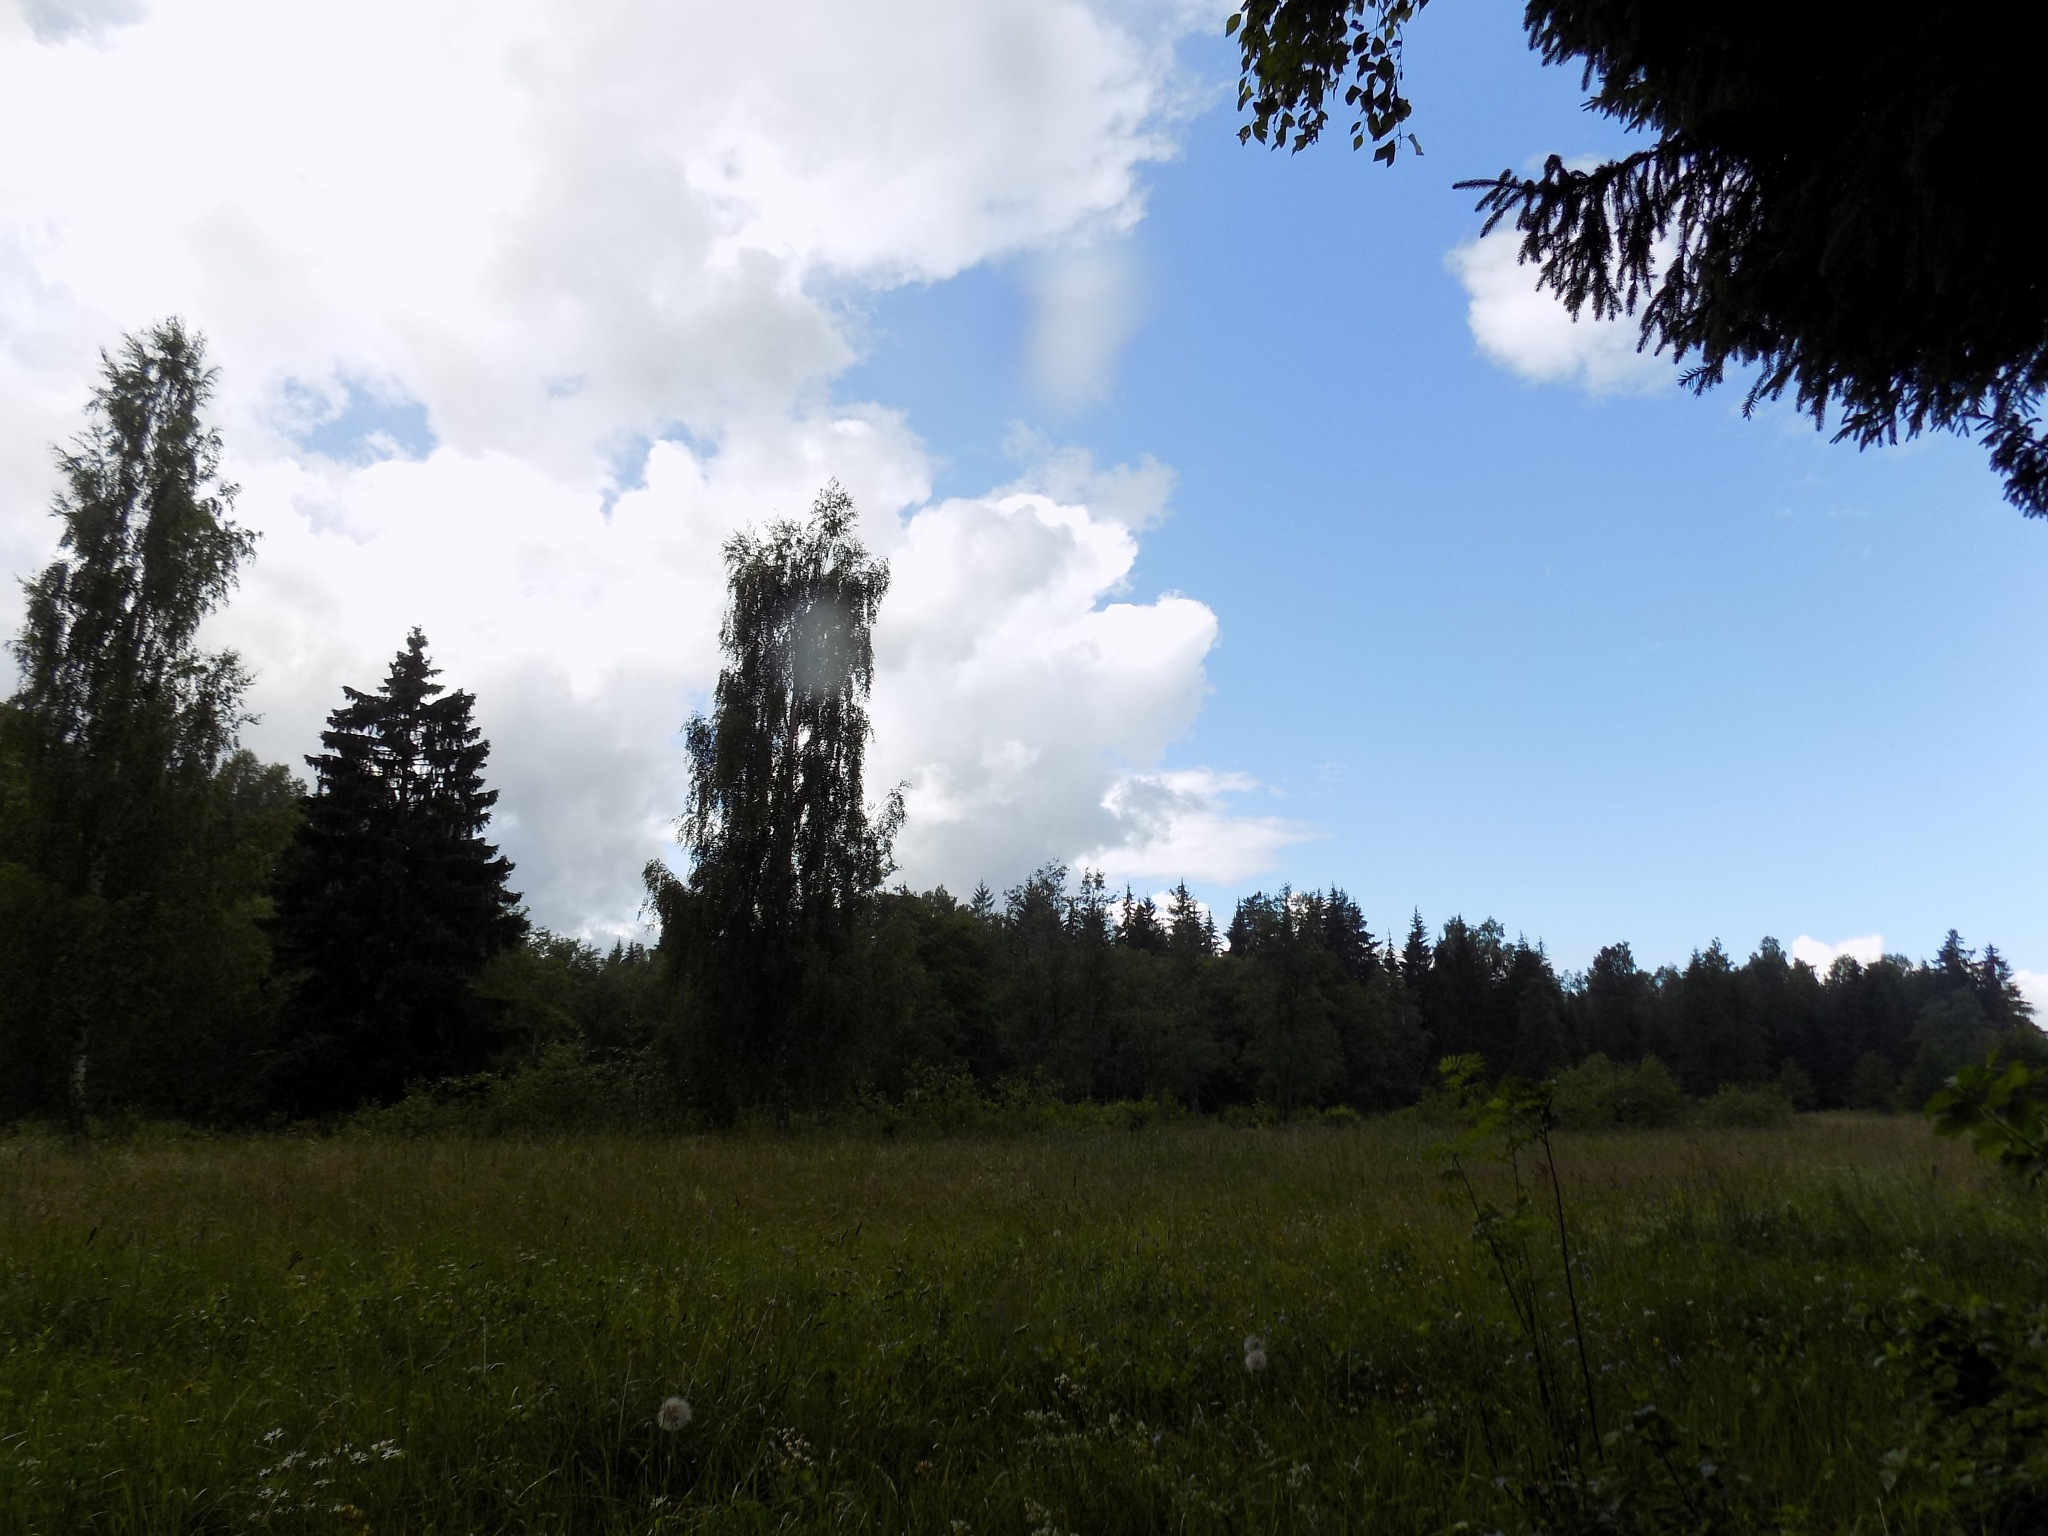 Nature in the summer by uzkuraitiene62